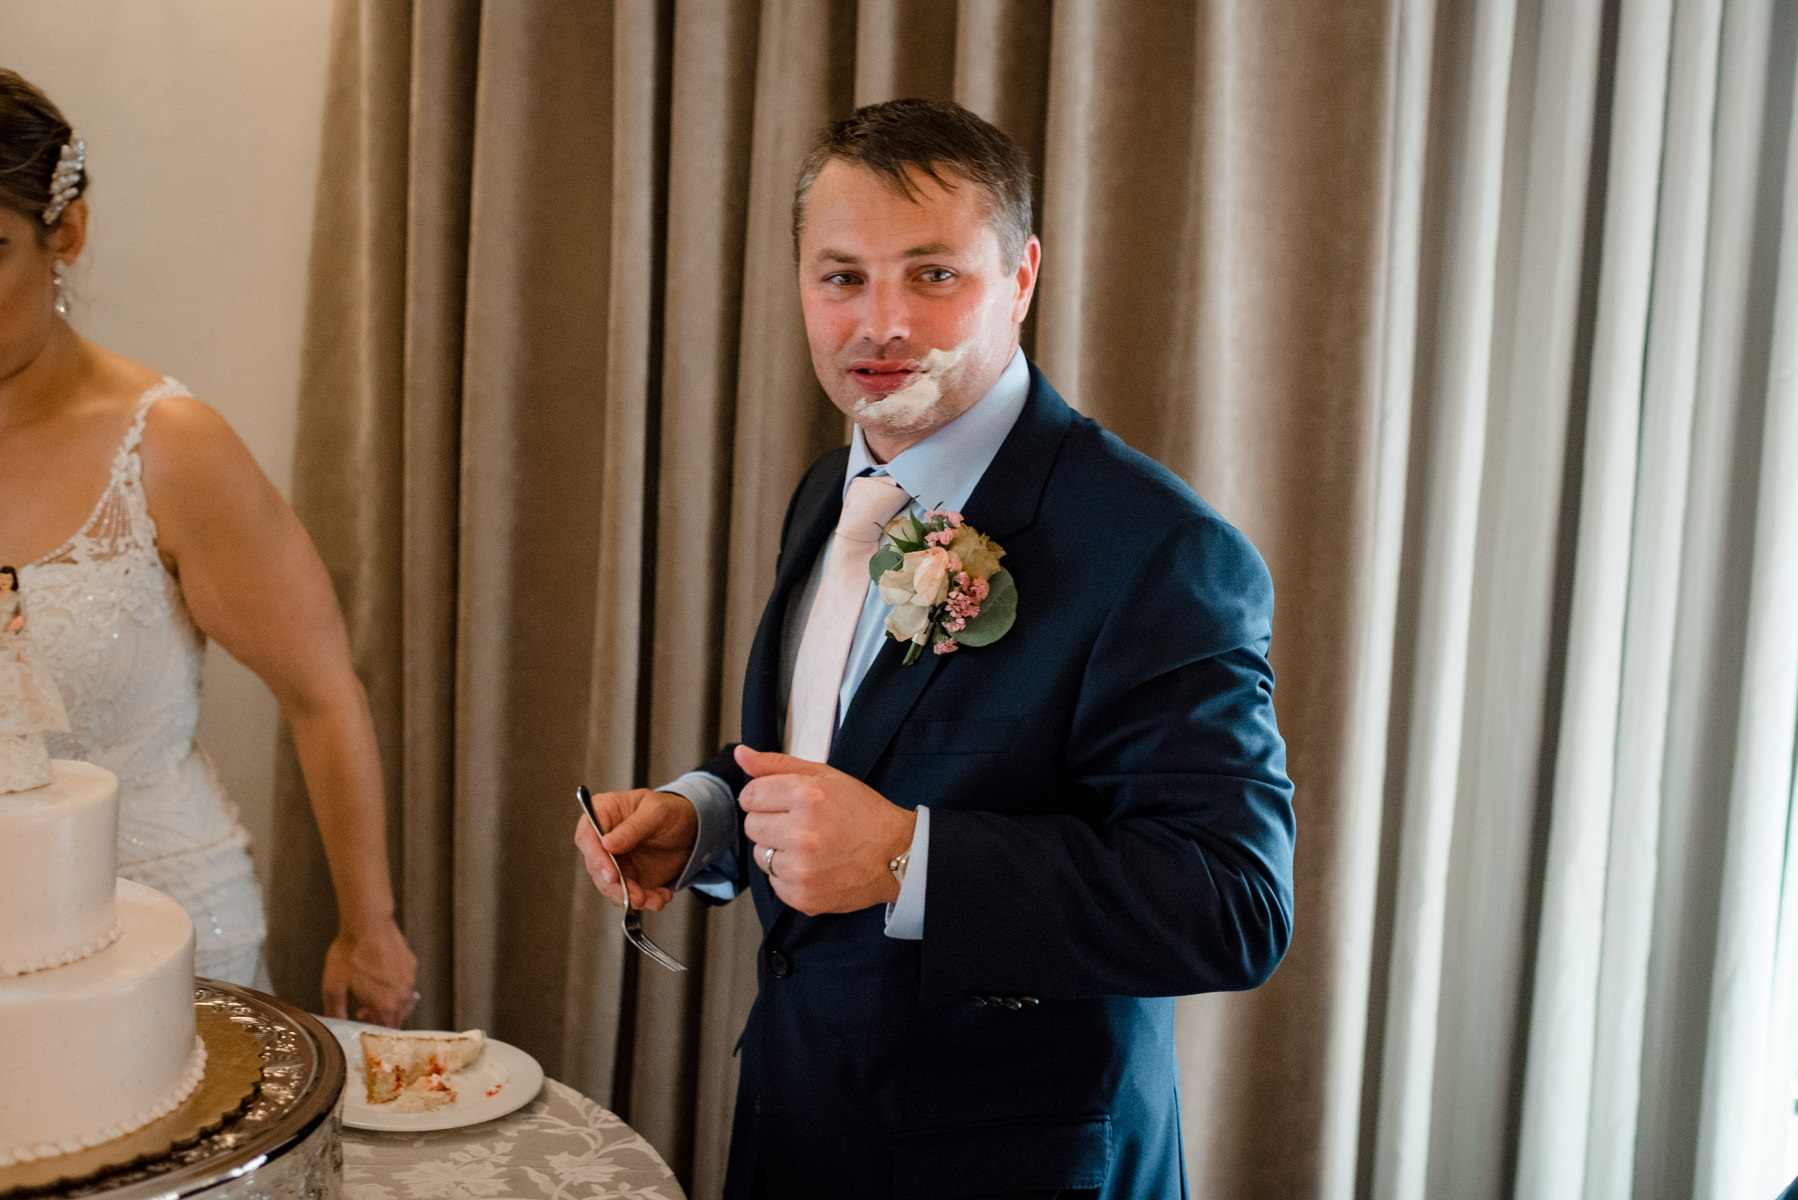 Andrew Tat - Documentary Wedding Photography - Hotel Sorrento - Seattle, Washington -Jessica & Paul - 38.jpg